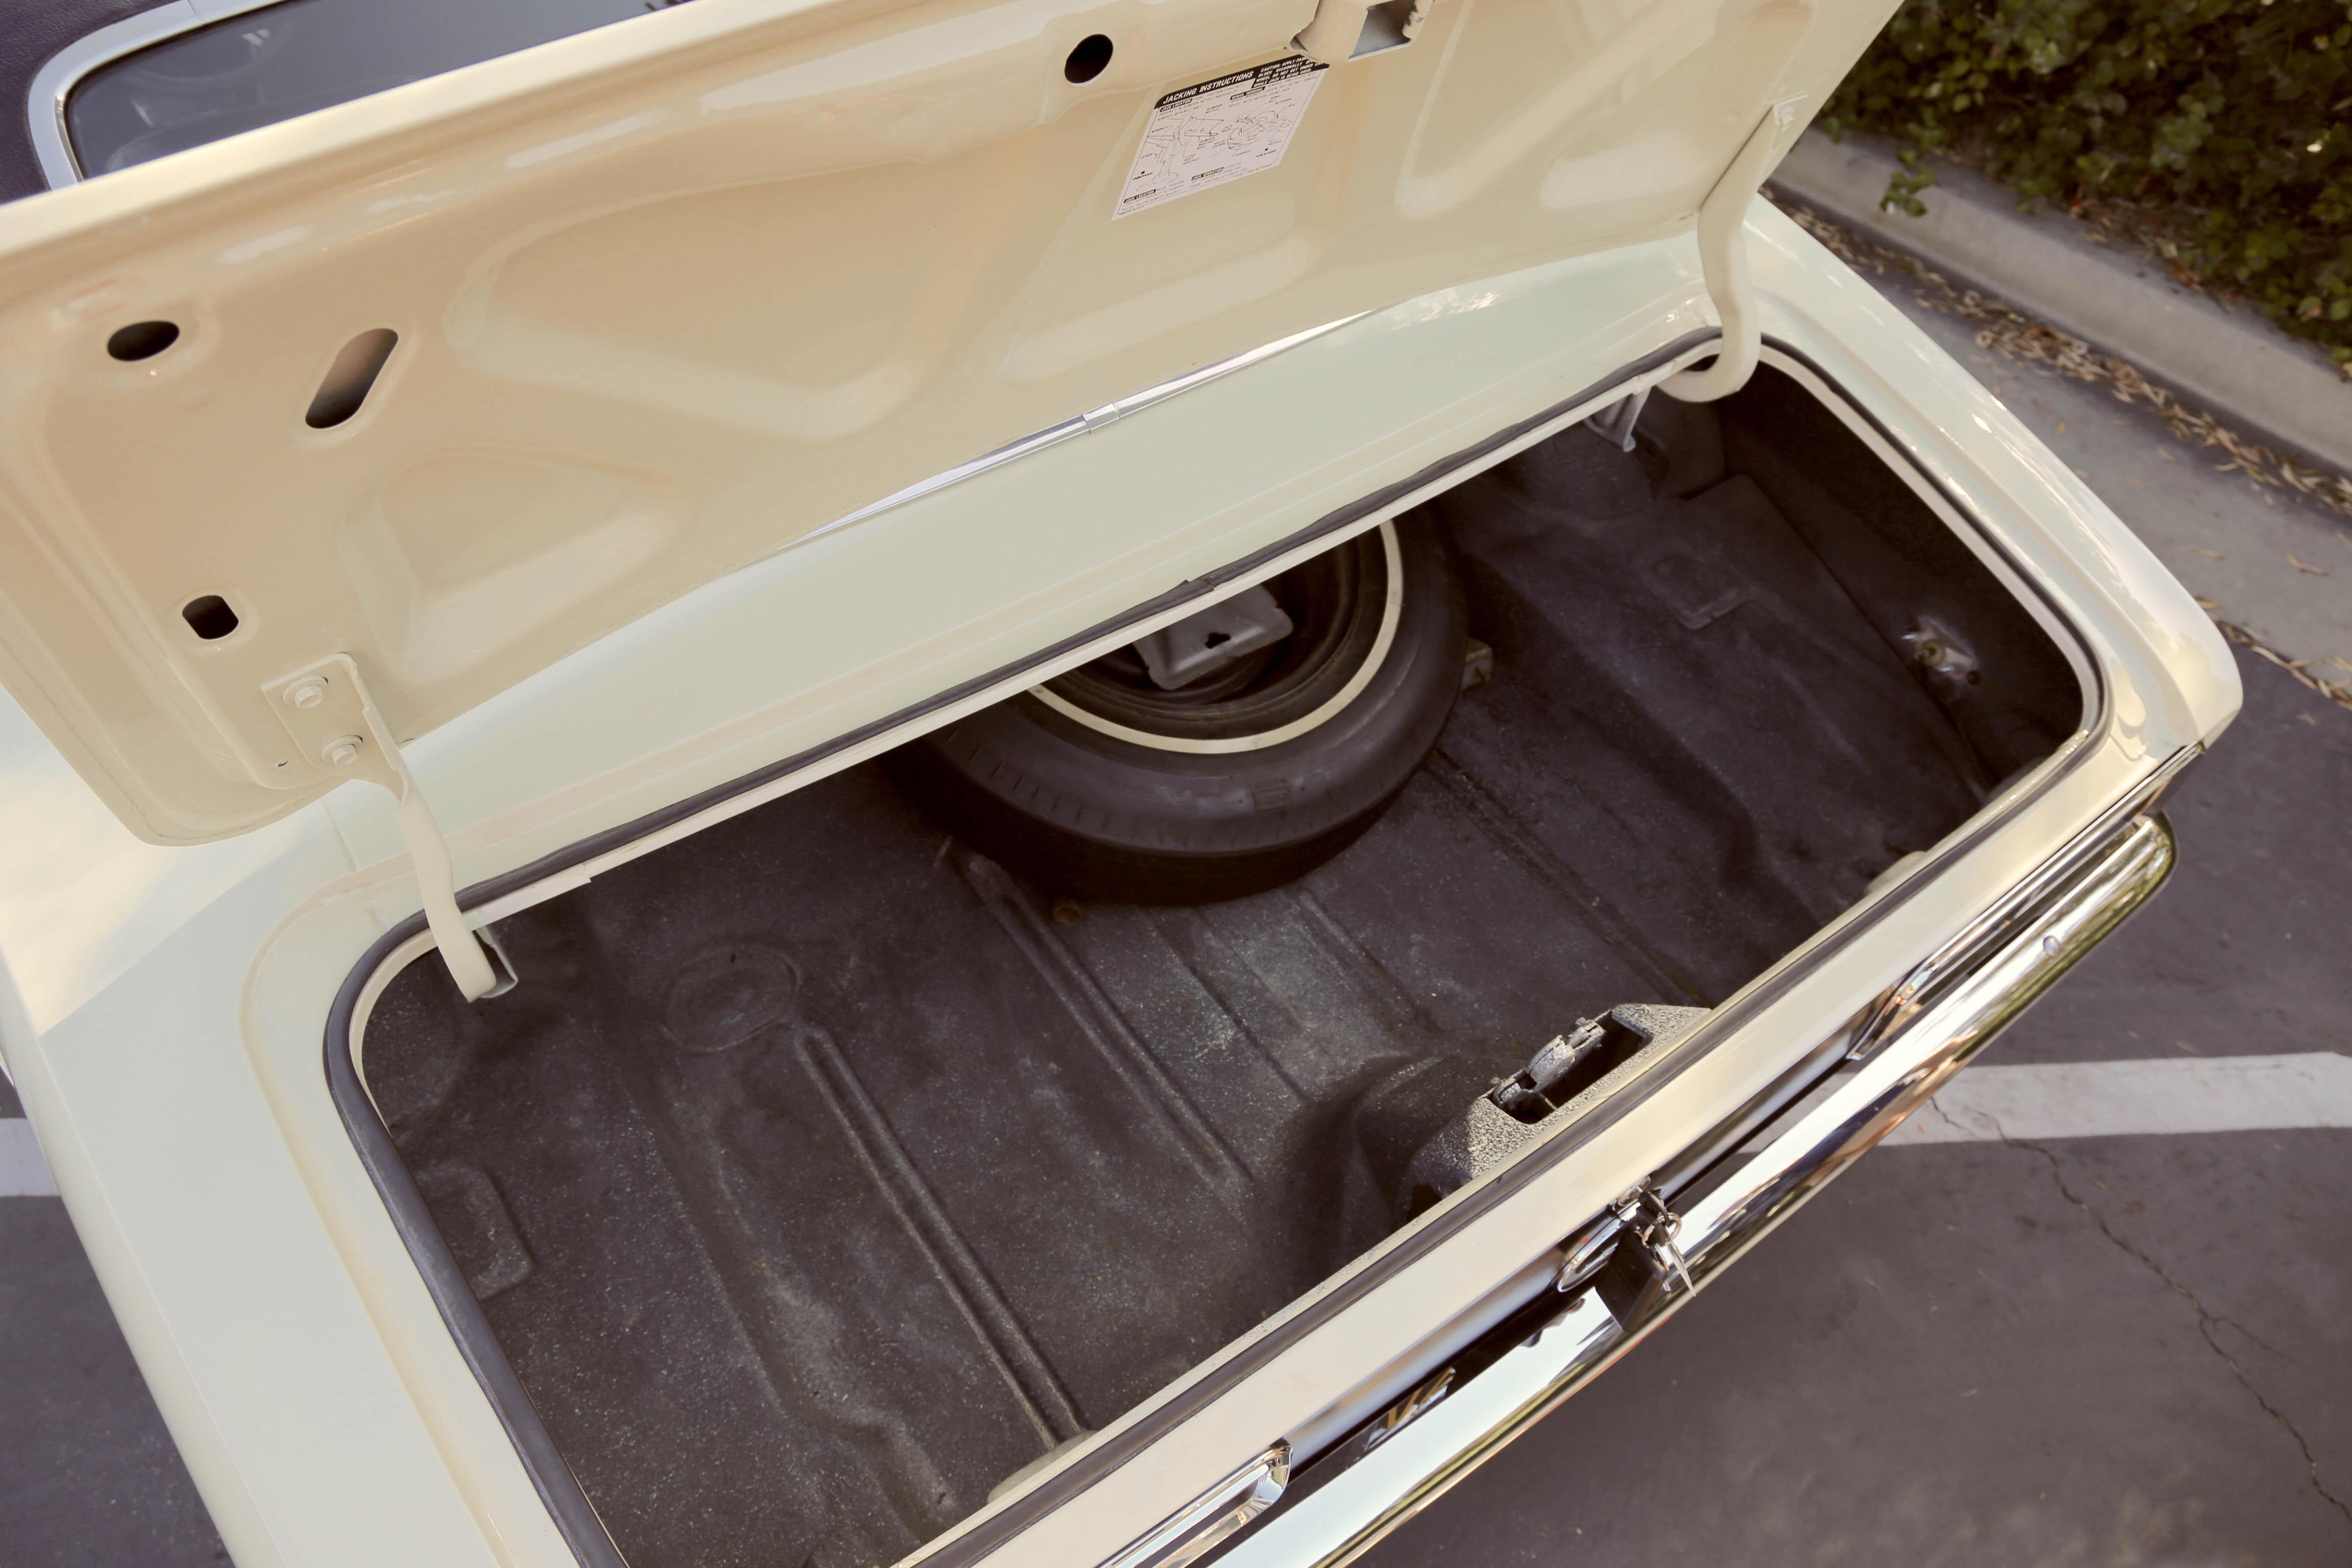 1968 Camaro Odd Options trunk opening